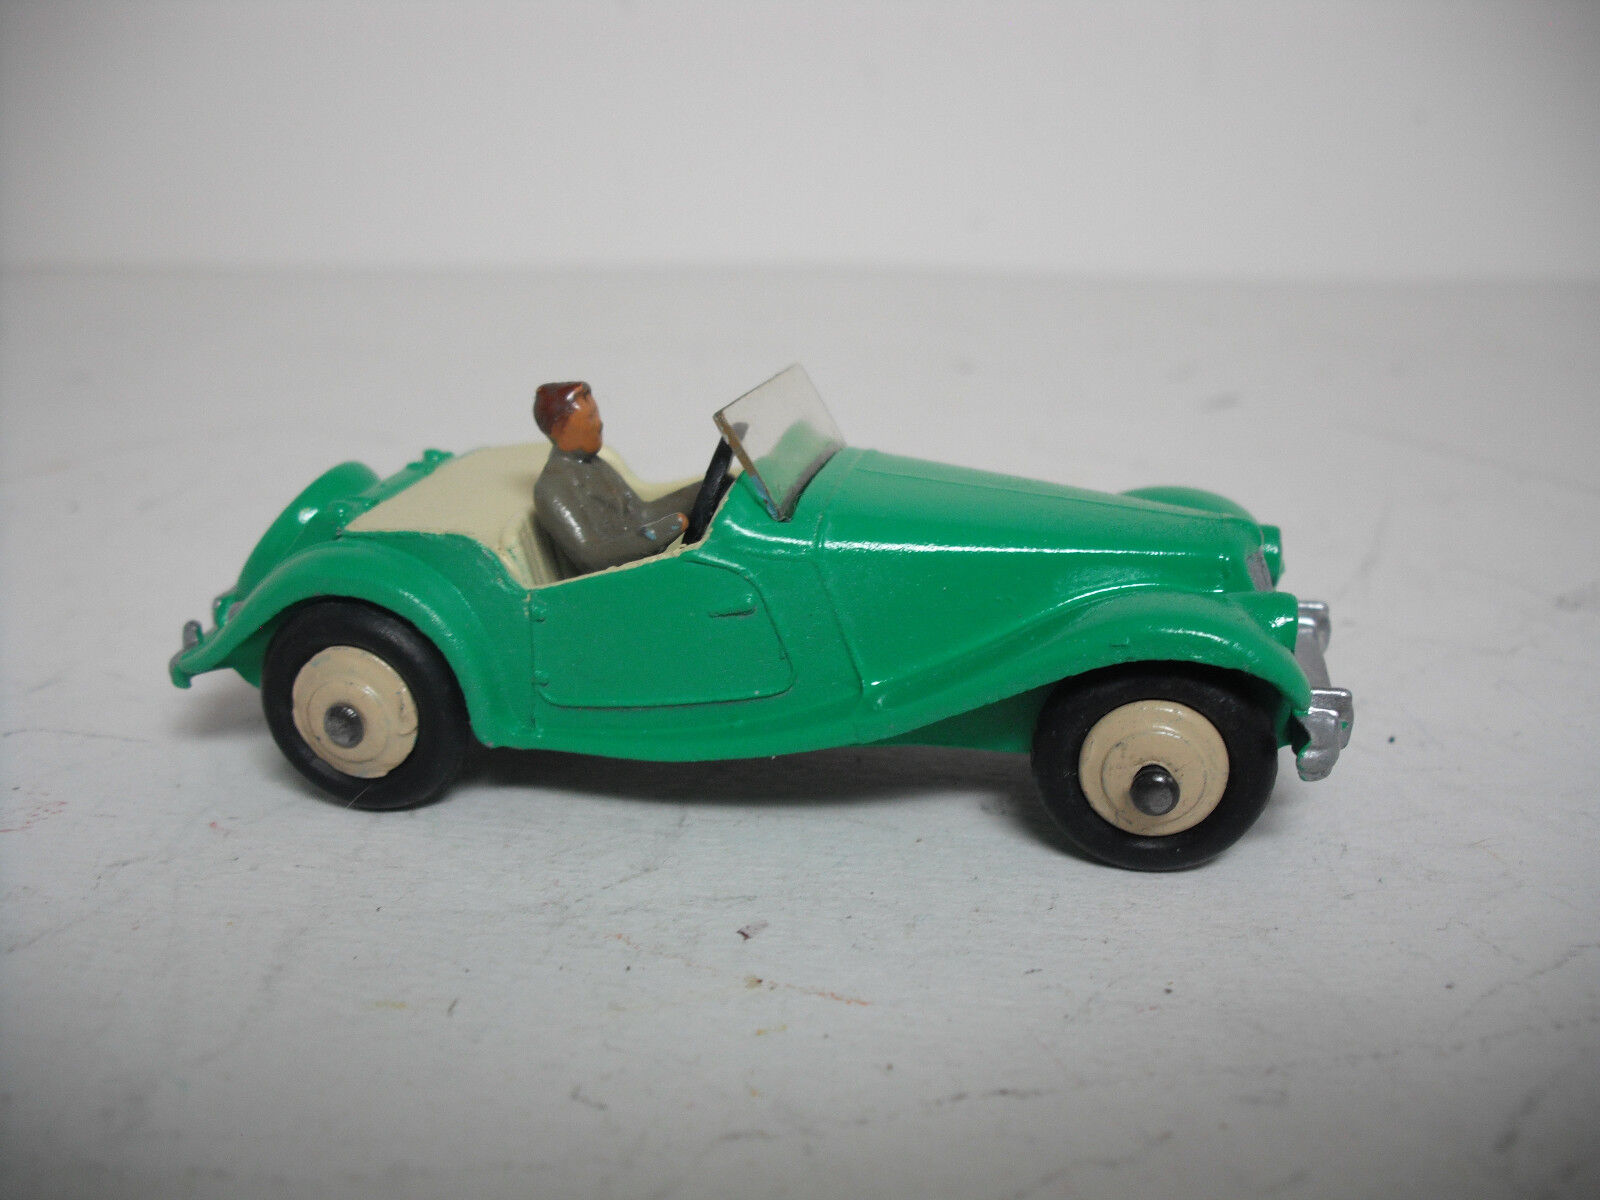 MECCANO LTD. Dinky Toys  102 H mg-Midget. restauré Touring Modèle. Near Comme neuf